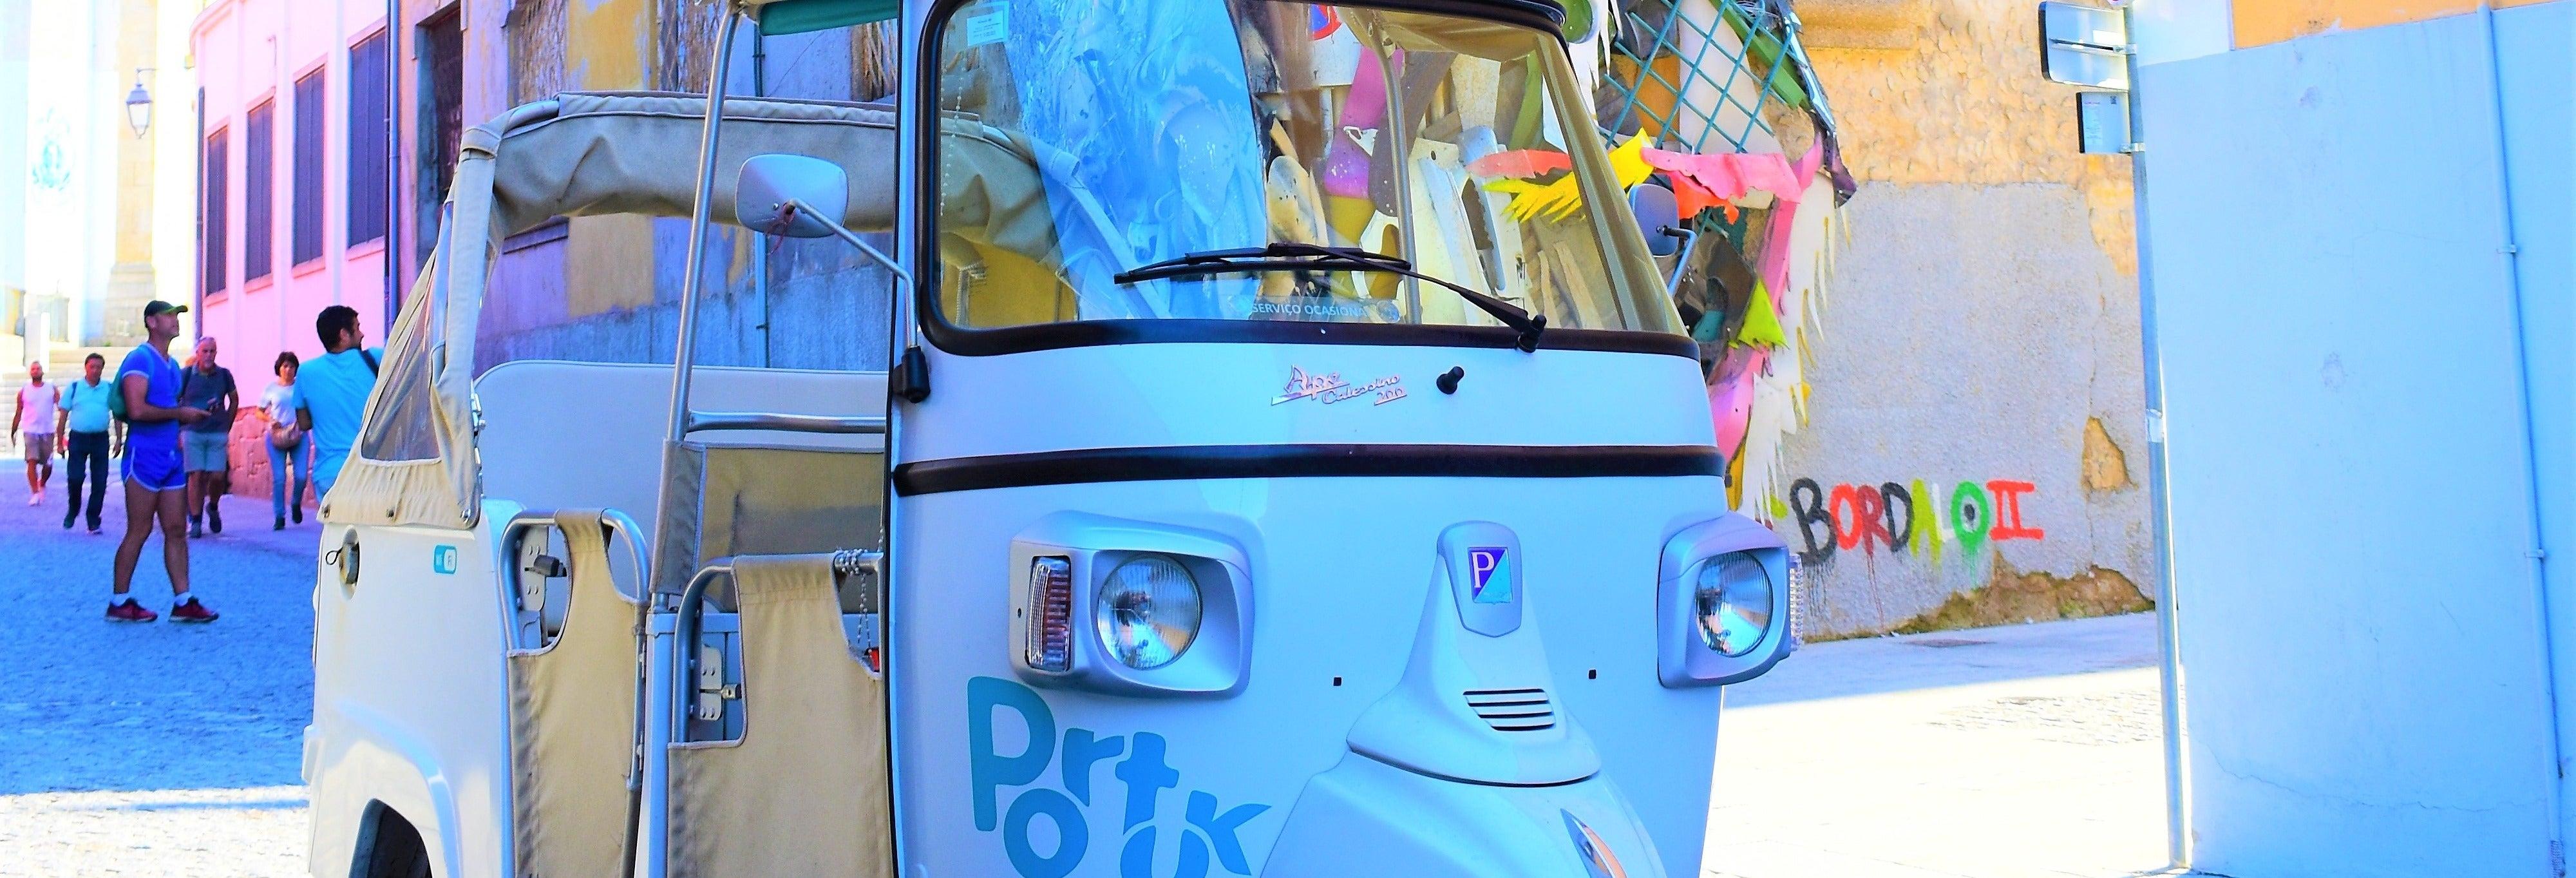 Tour di Porto in tuk tuk